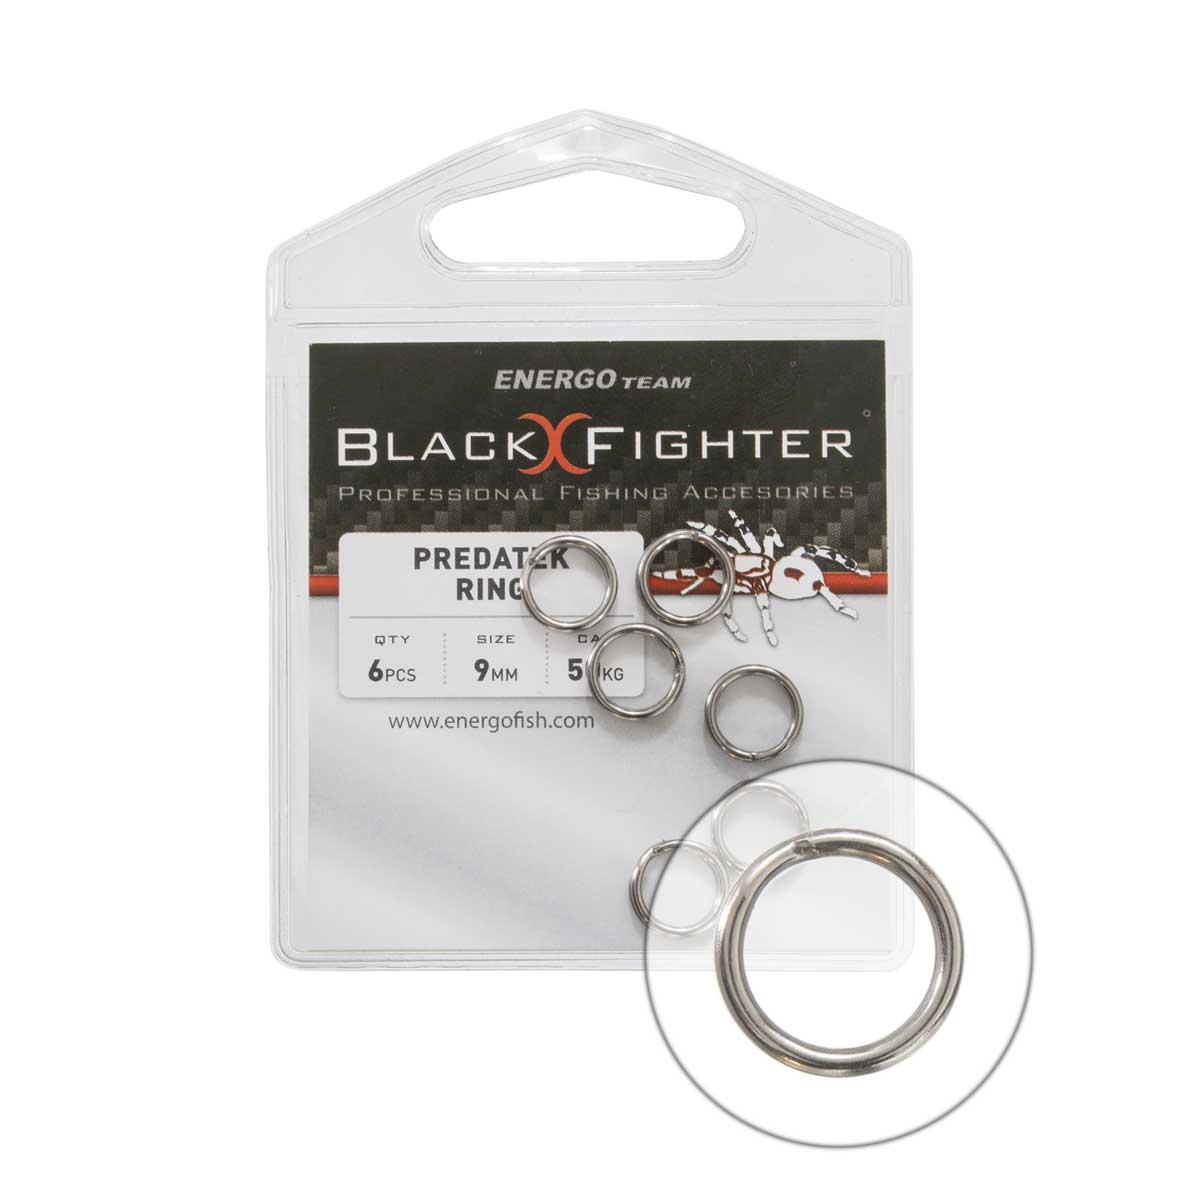 INELE DESPICATE BLACK FIGHTER PREDATEK 5 9MM 50KG - 82061105